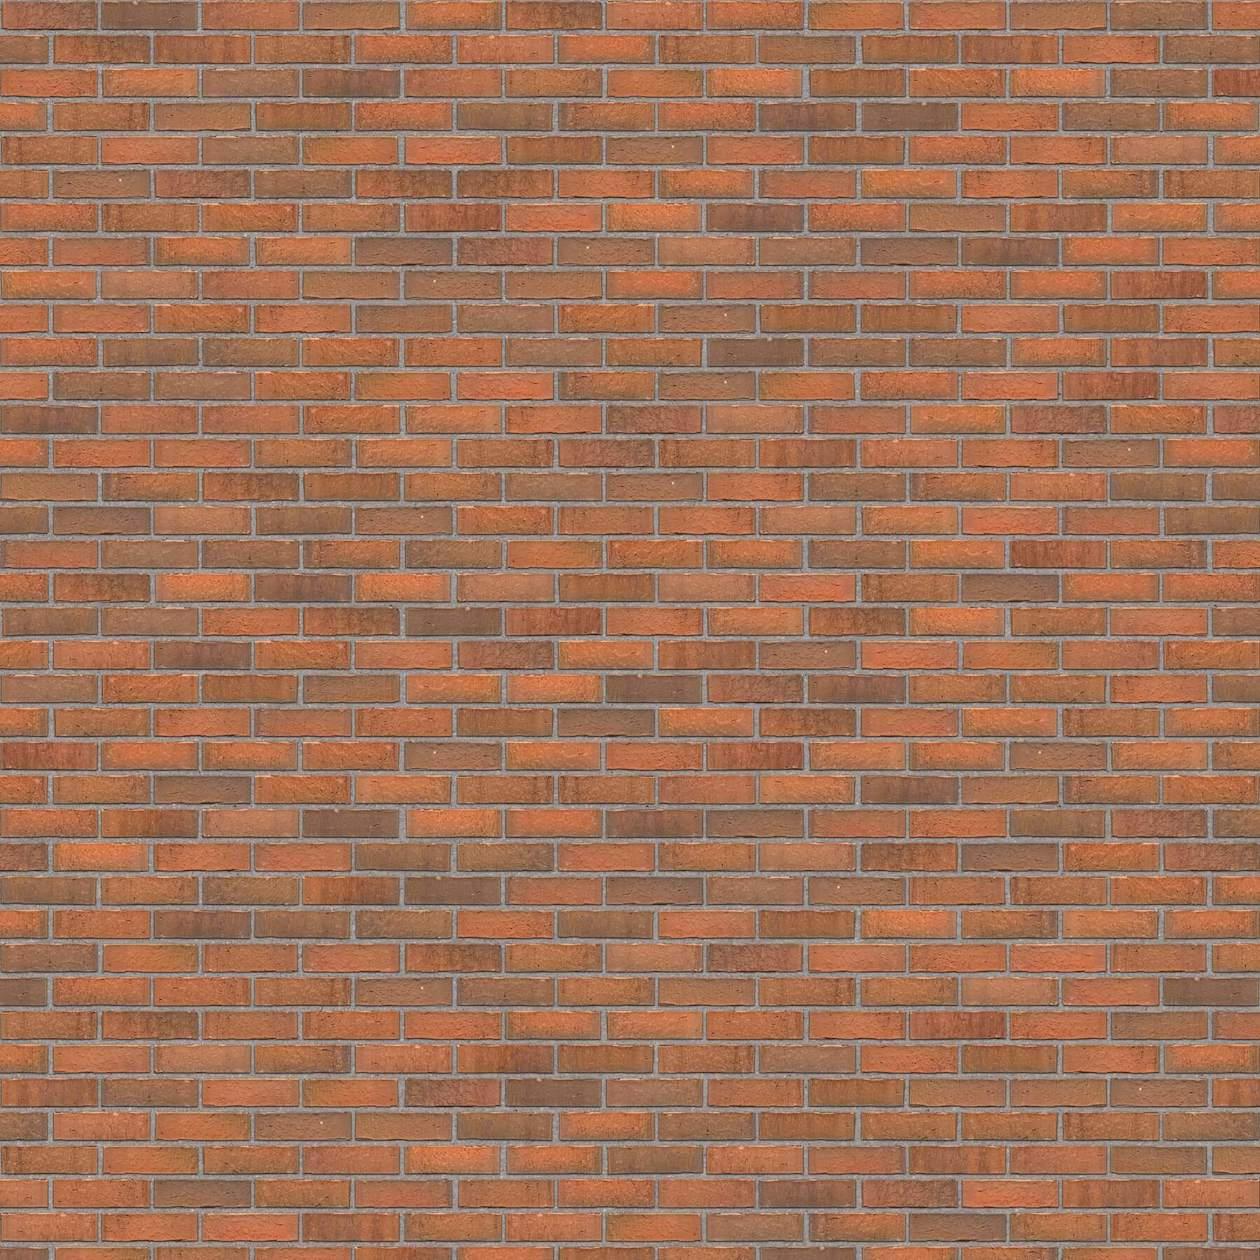 Puna-cigla-FeldHaus-Klinker-brick-house-beograd-nf-k-767-Siva Fuga